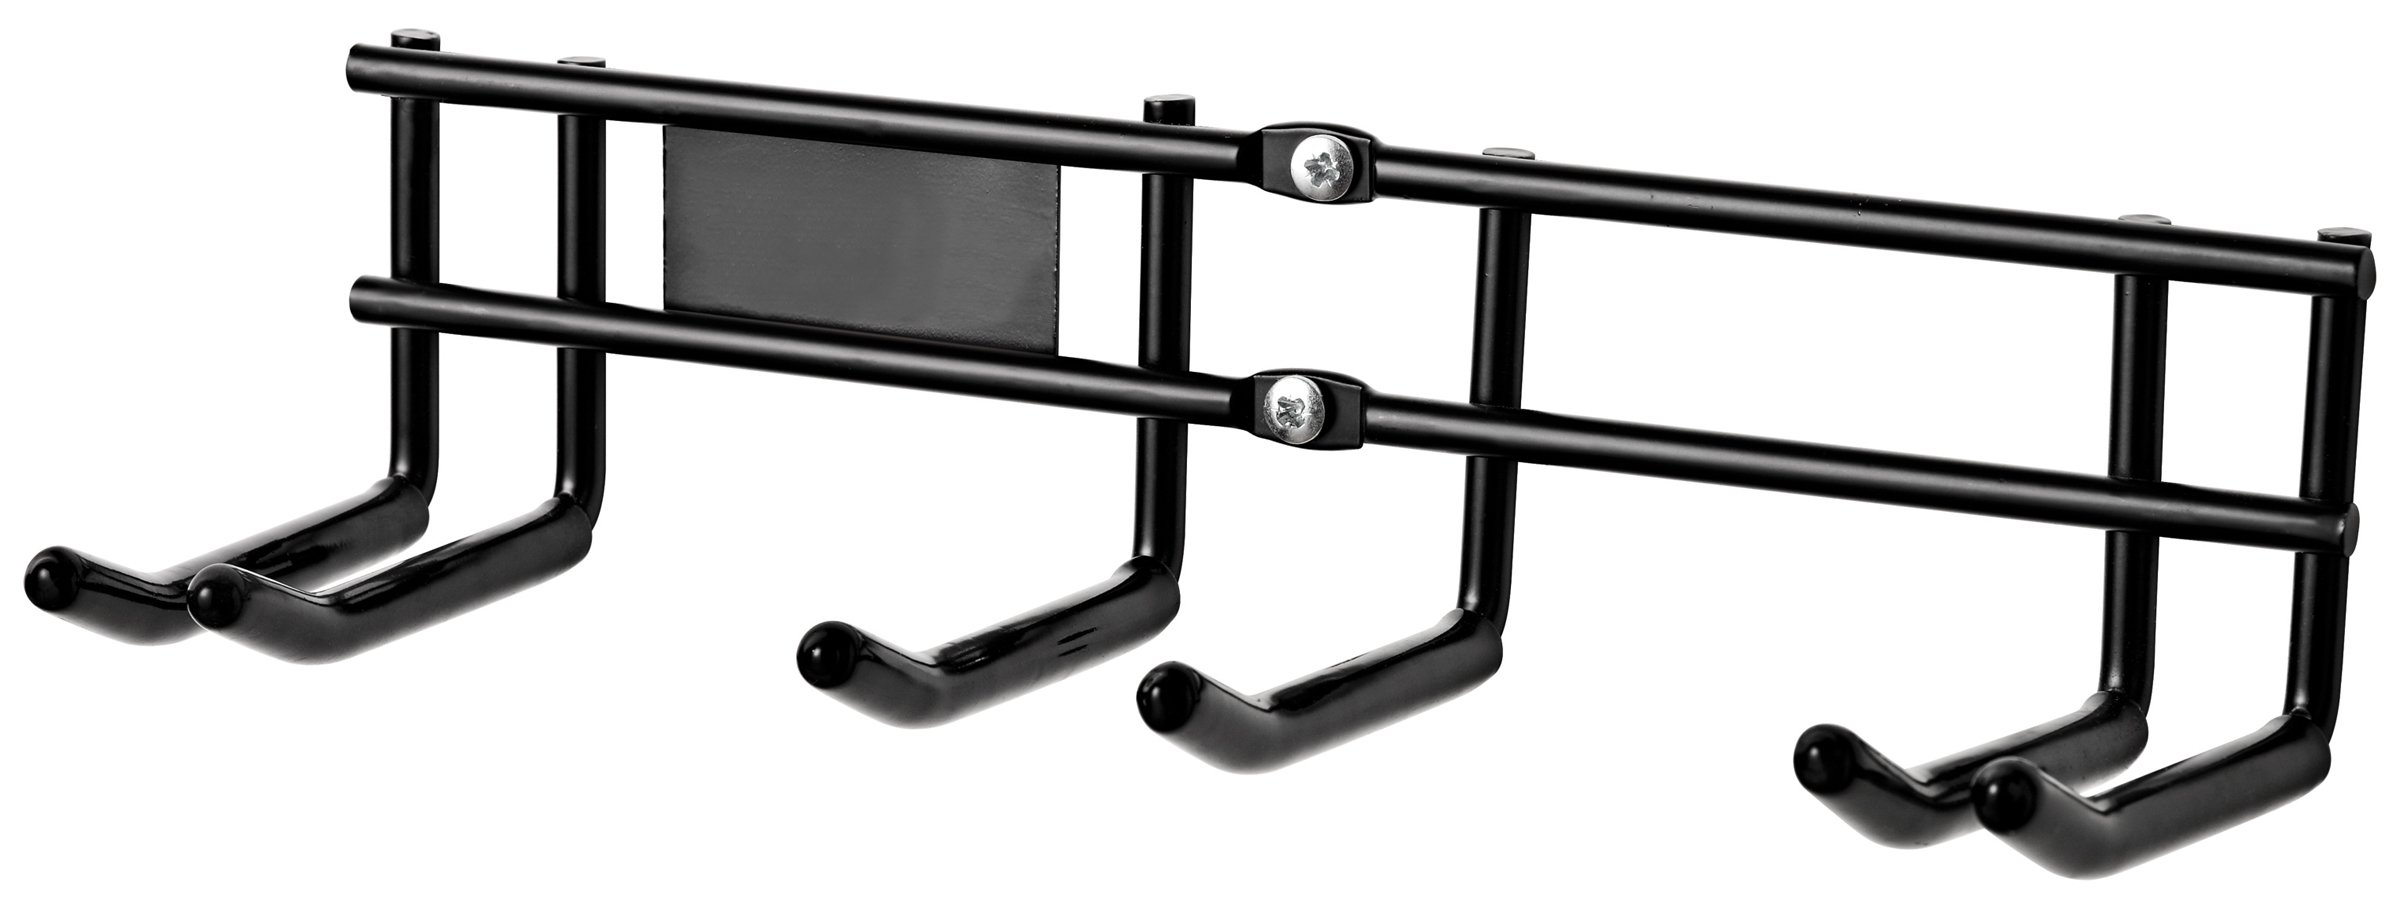 Itw PS-2R Ski & Pole Rack